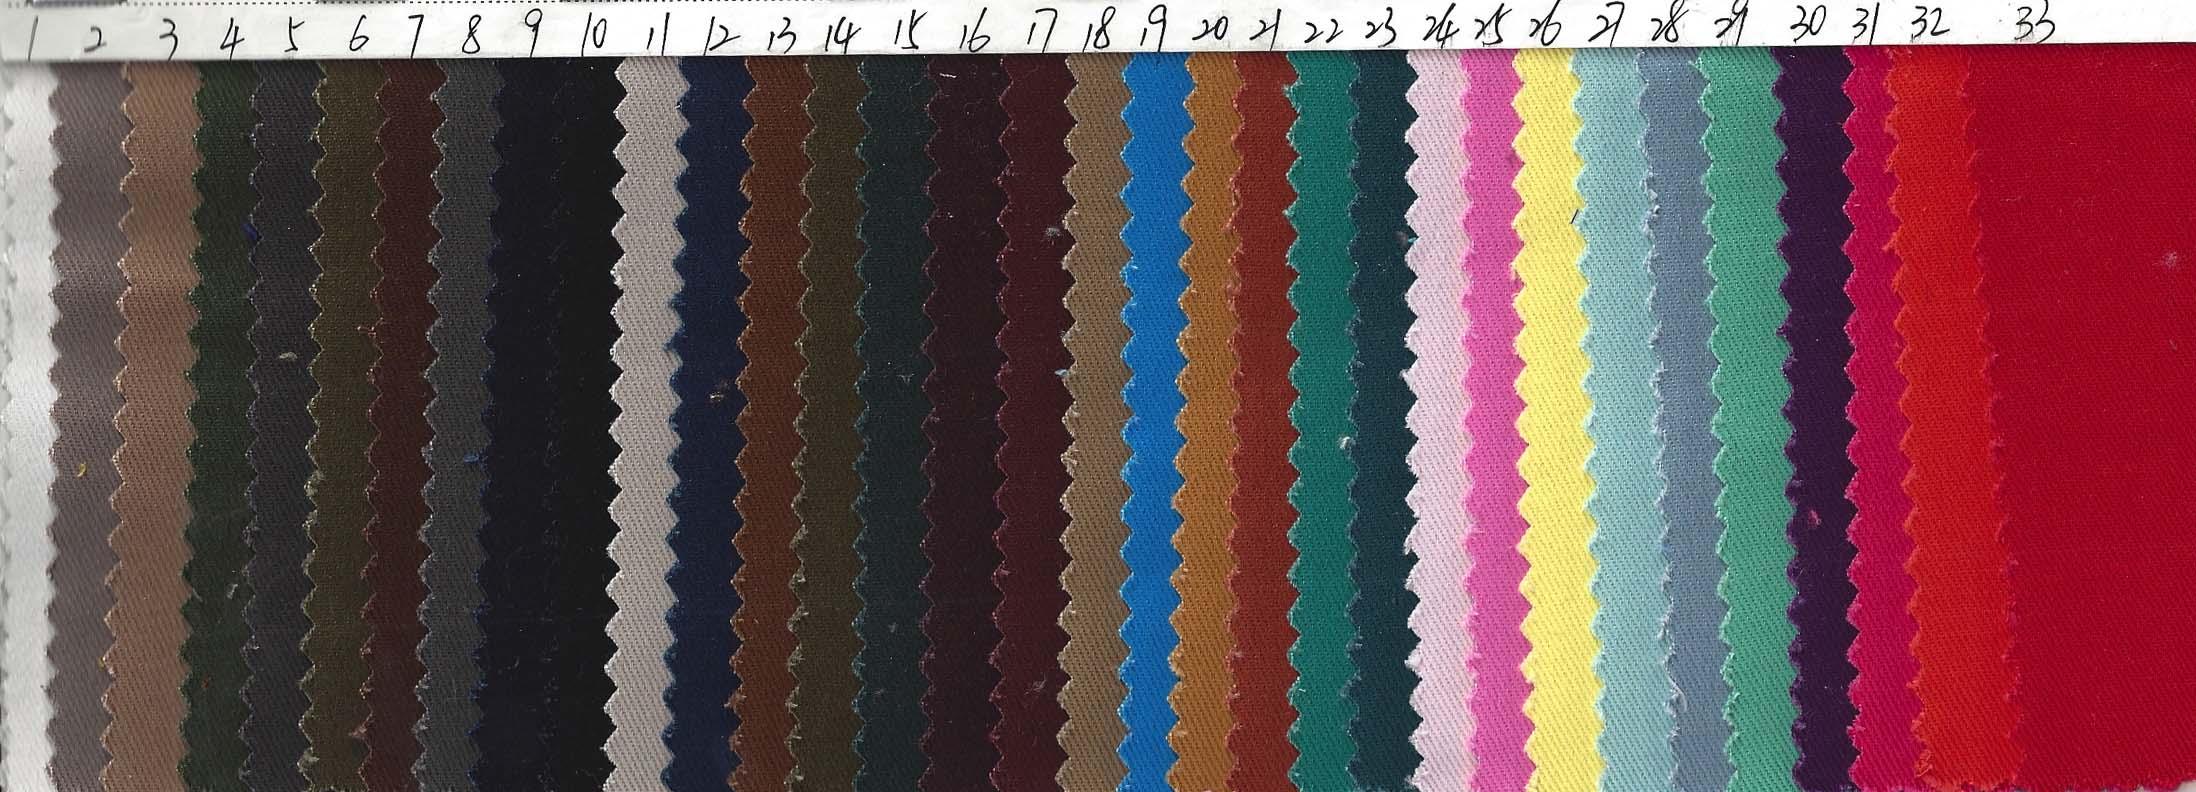 Huaya Textile cotton twill A24-1.jpg